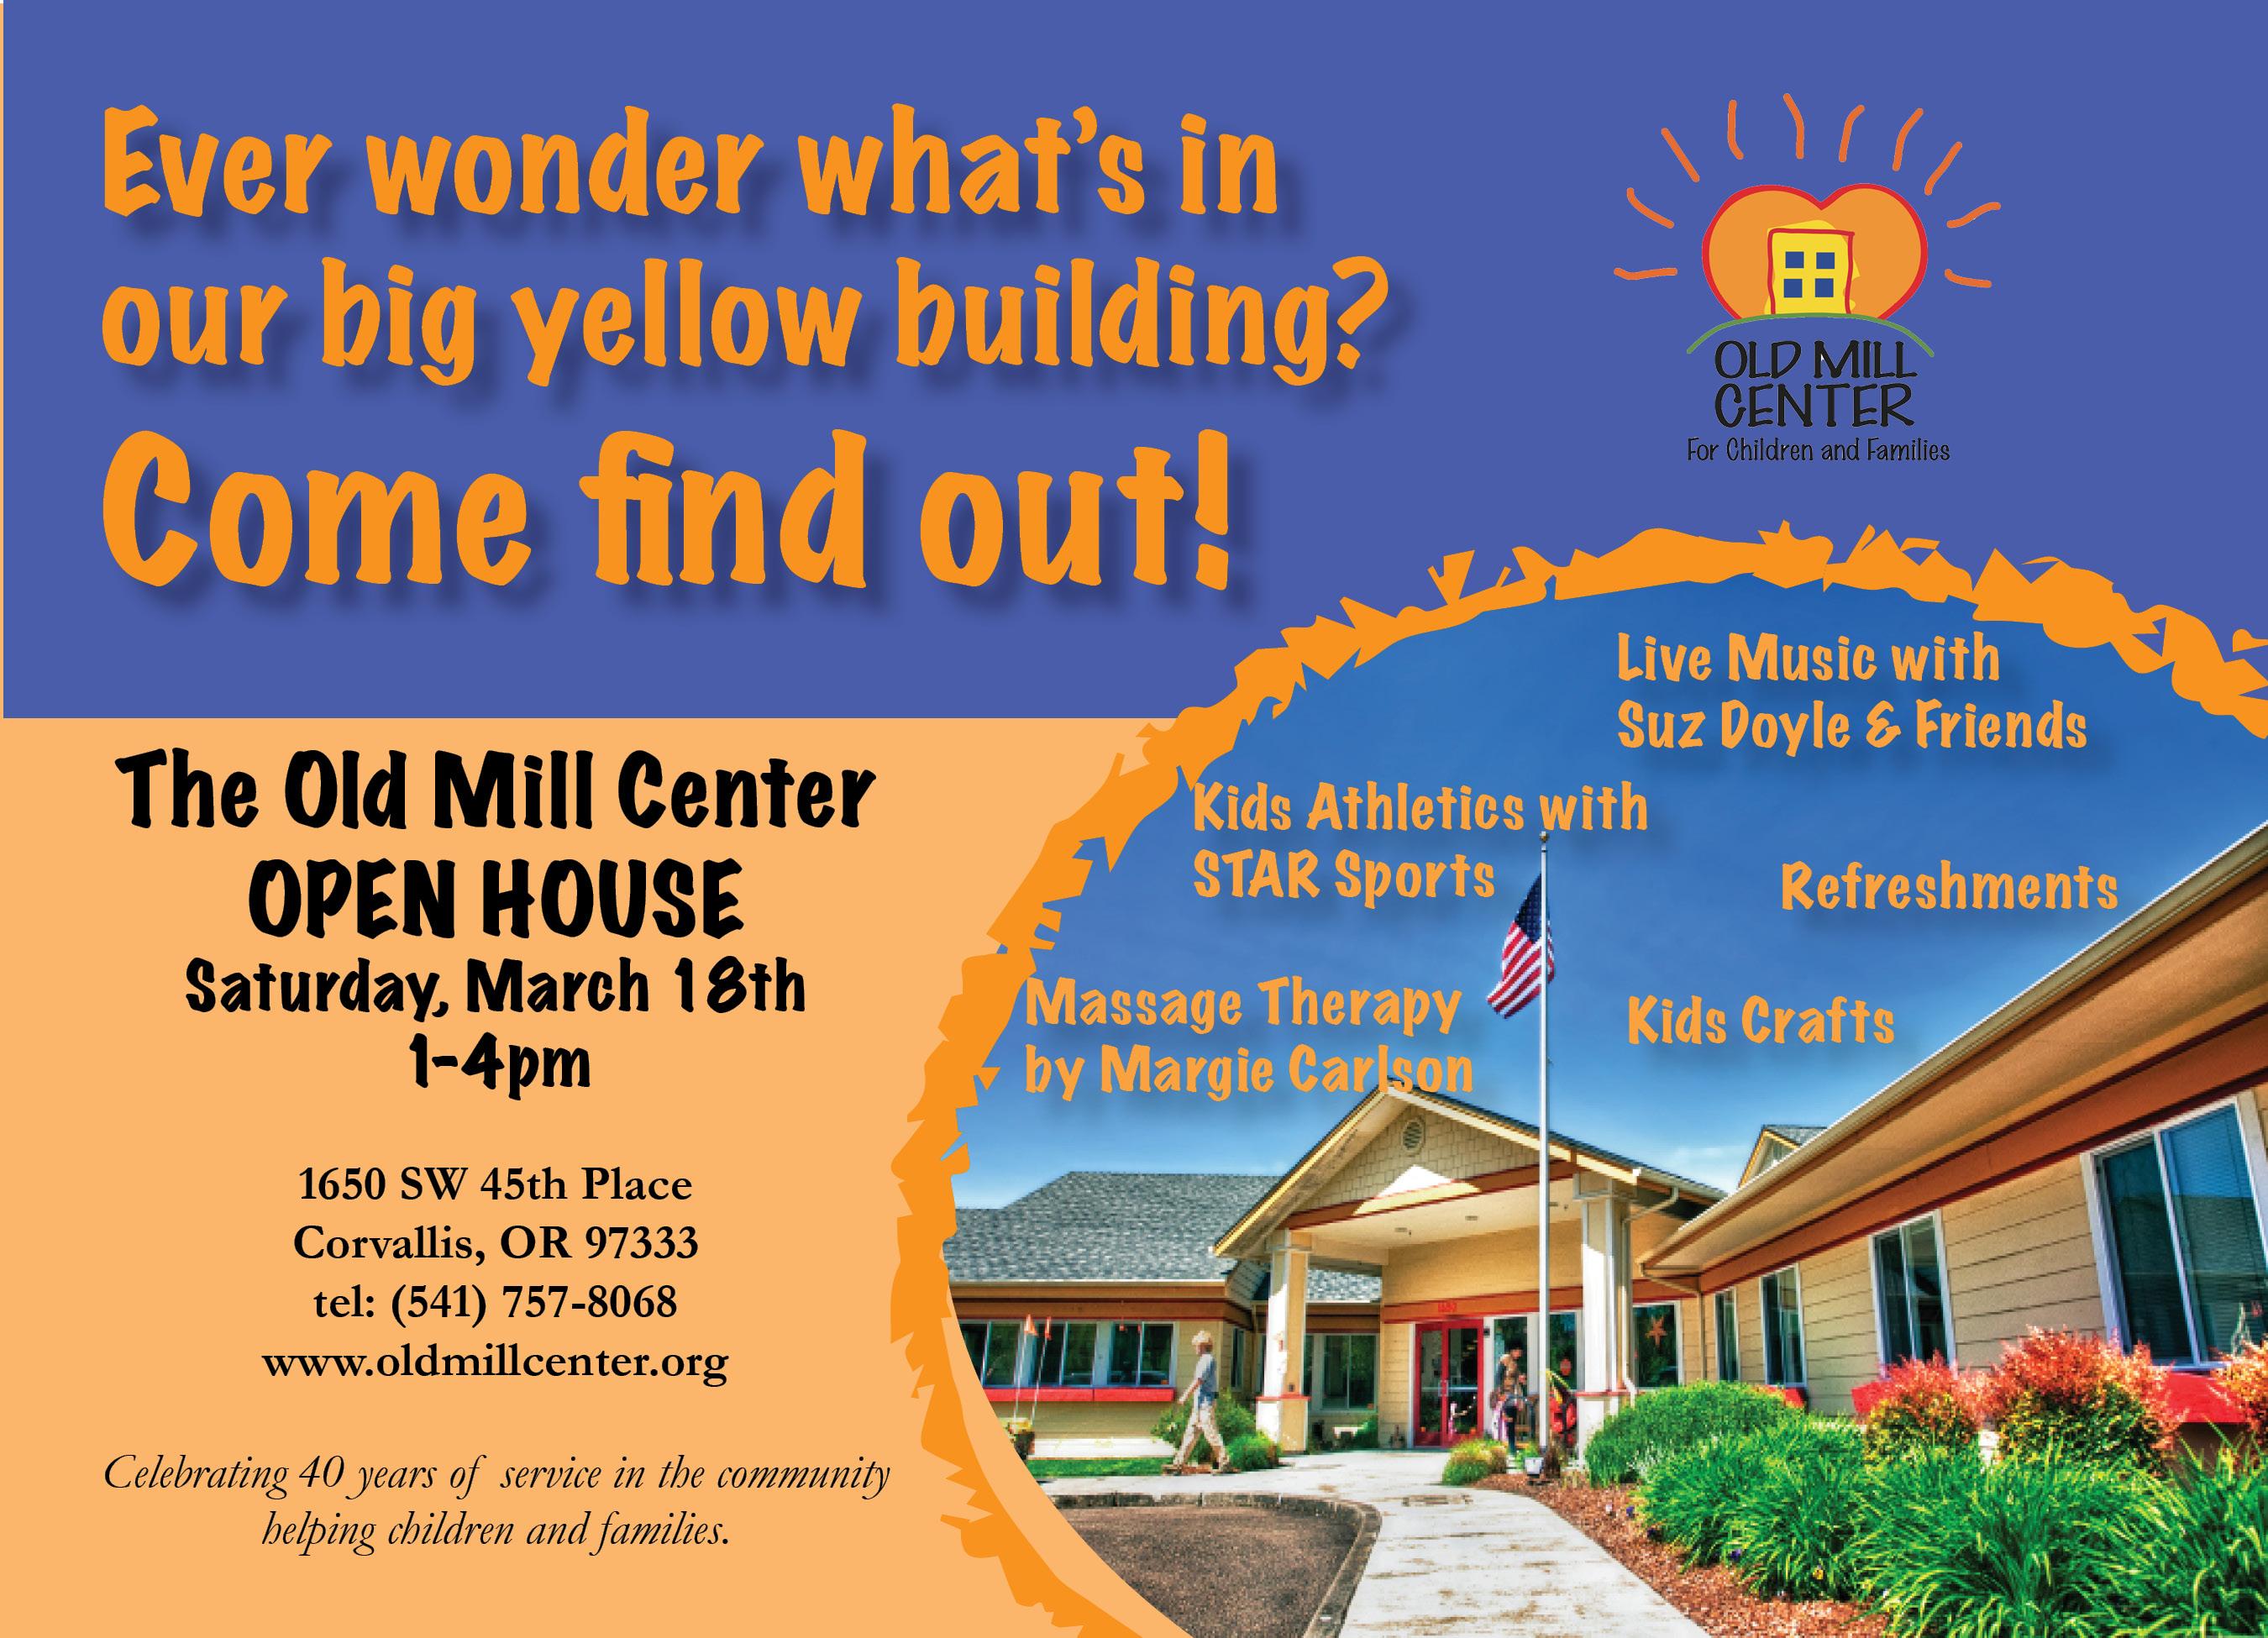 Open House Celebration - Old Mill Center